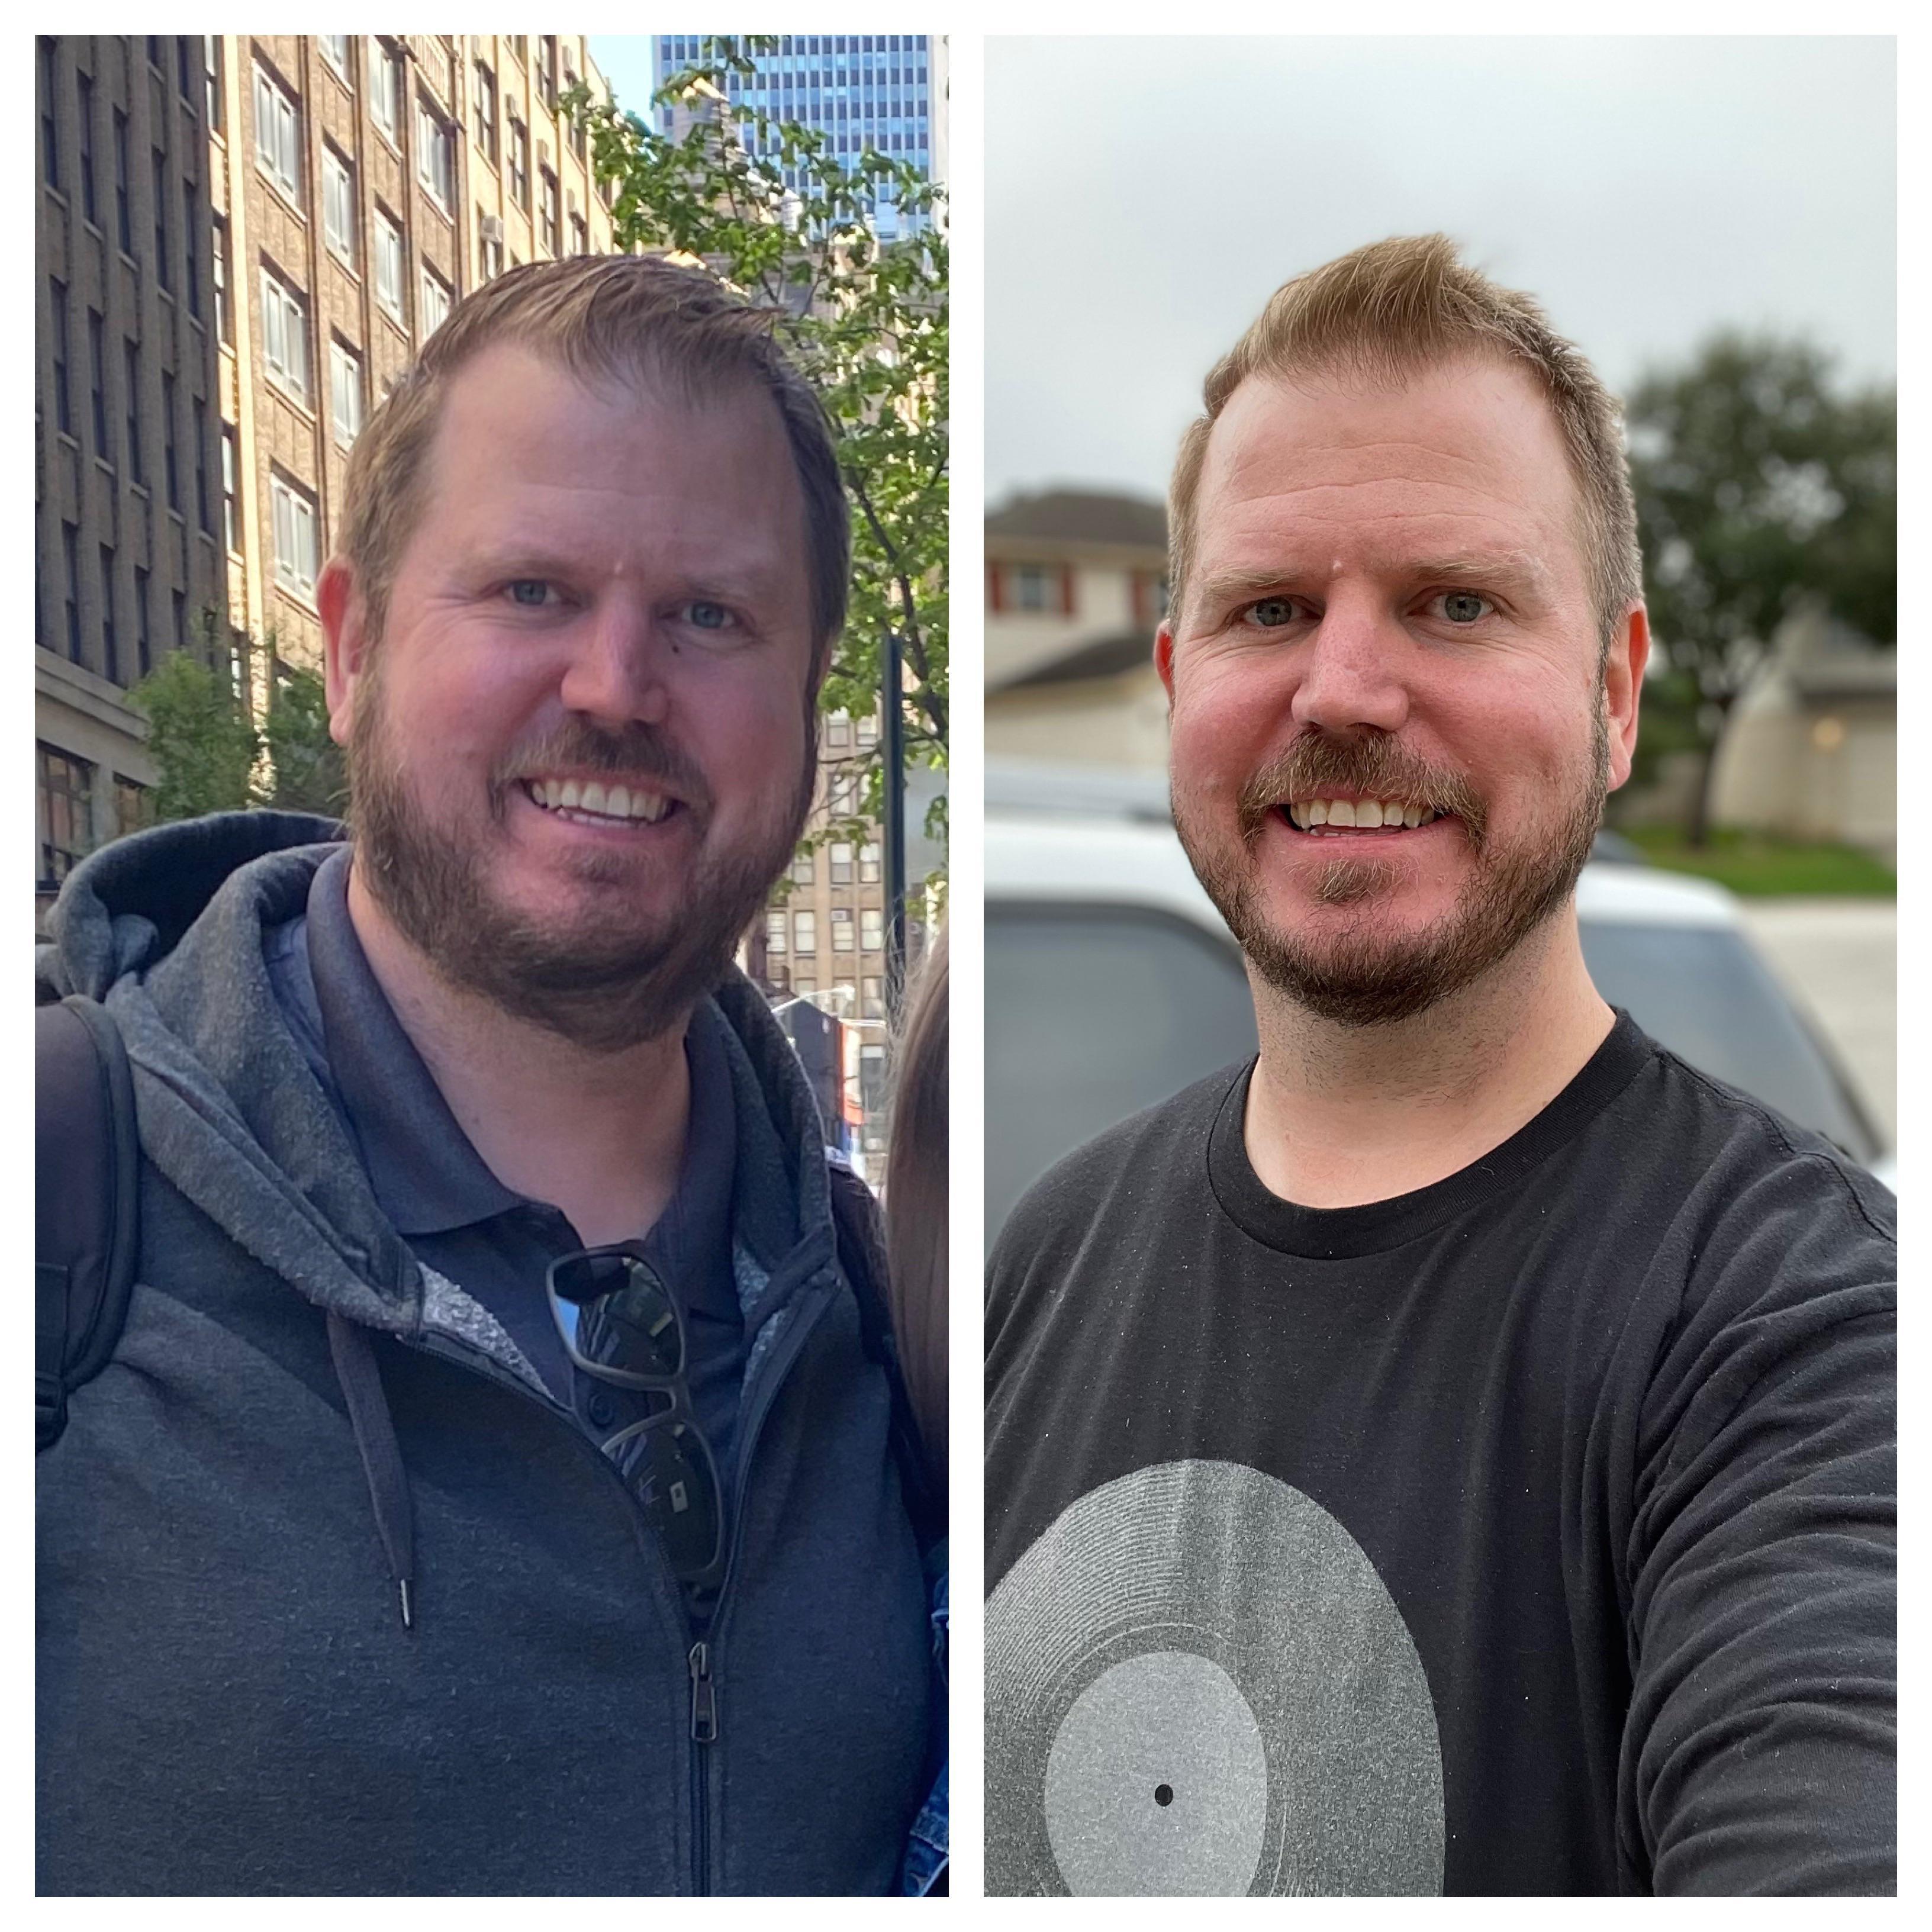 Progress Pics of 75 lbs Weight Loss 6 foot 5 Male 358 lbs to 283 lbs